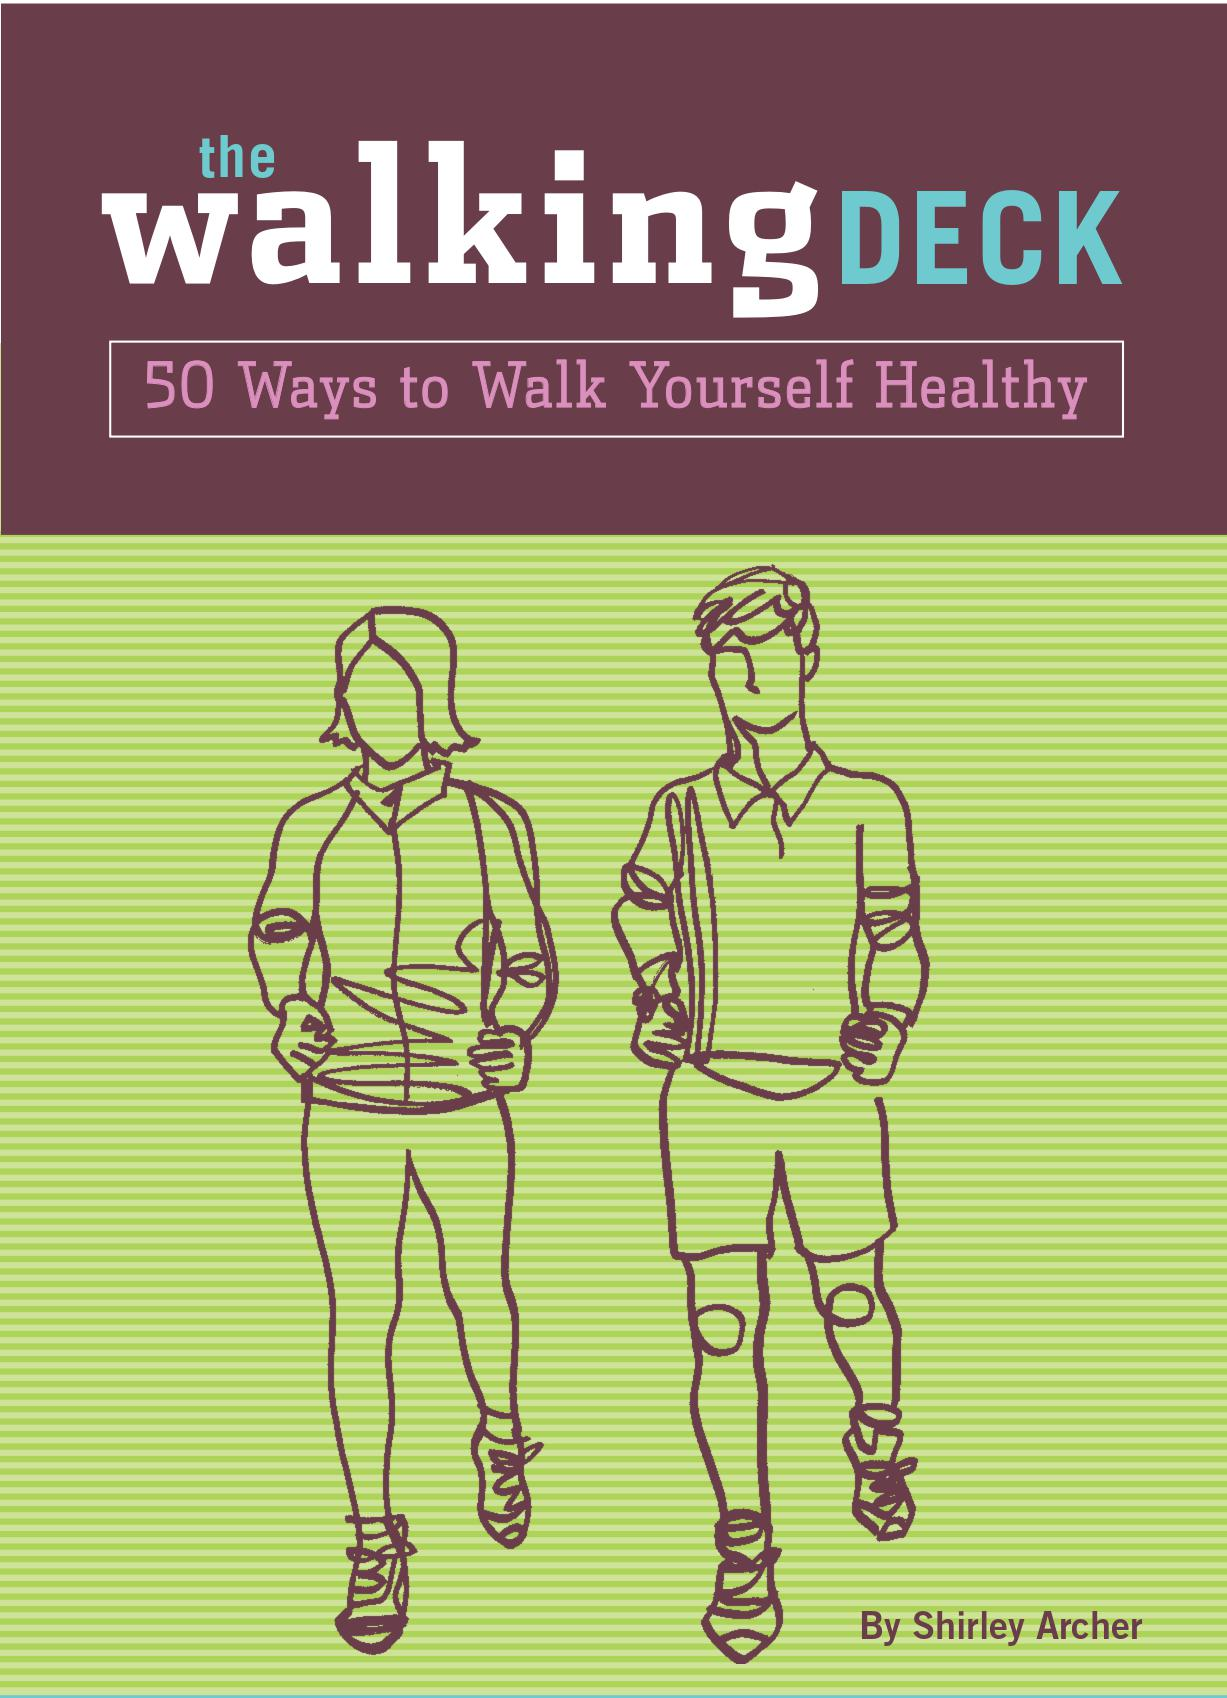 Walking Deck.jpg